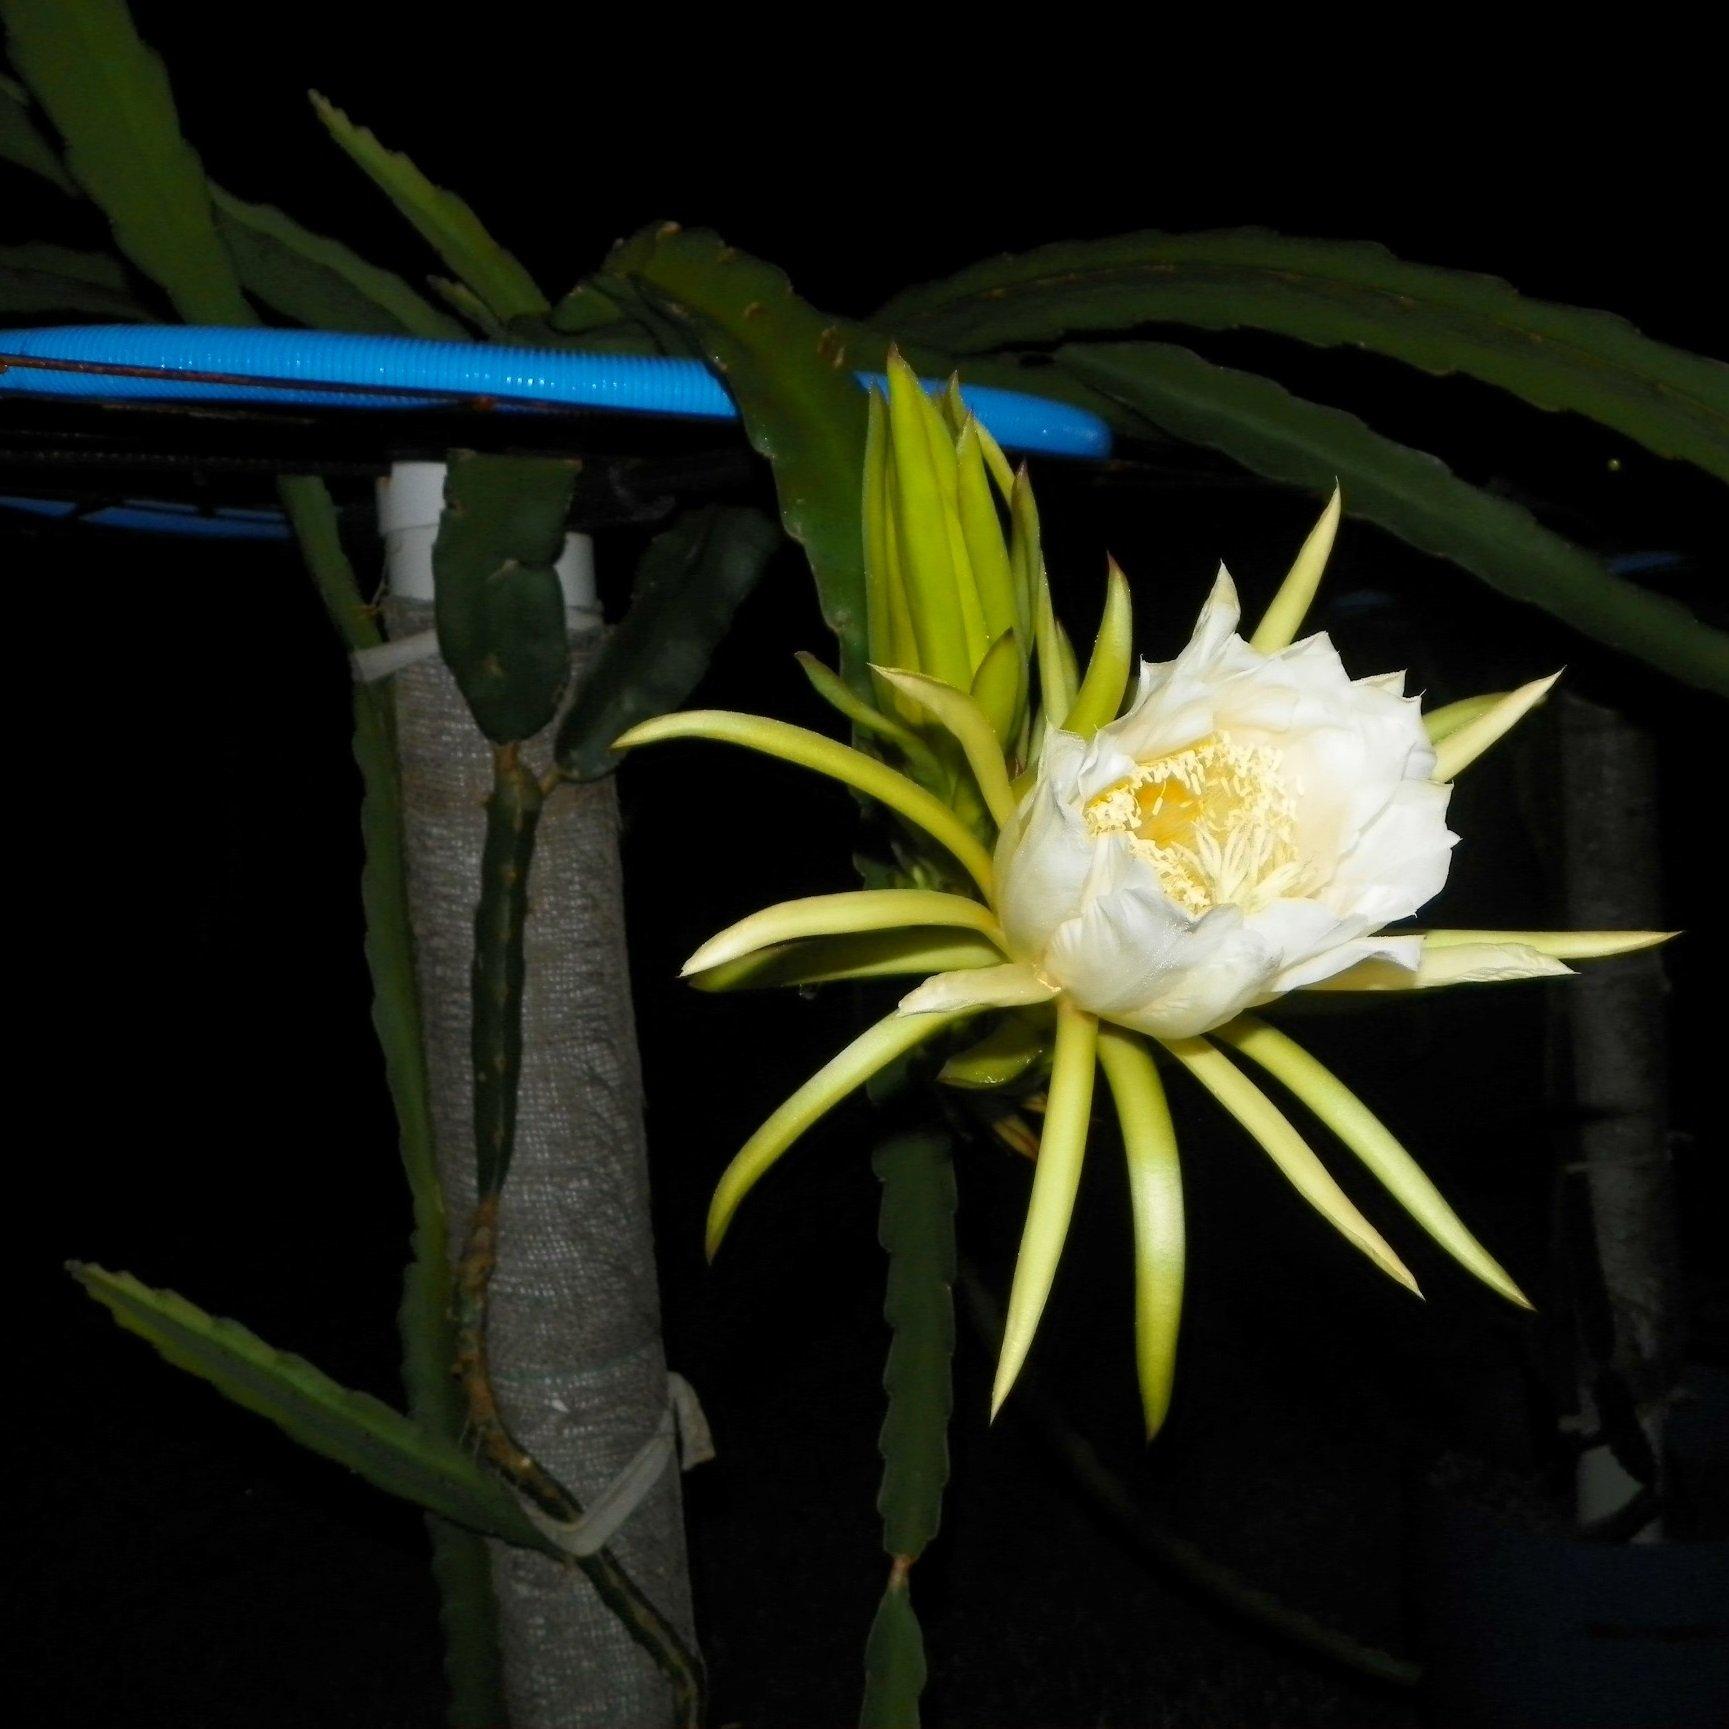 Dragon Fruit variety White Sapphire flower